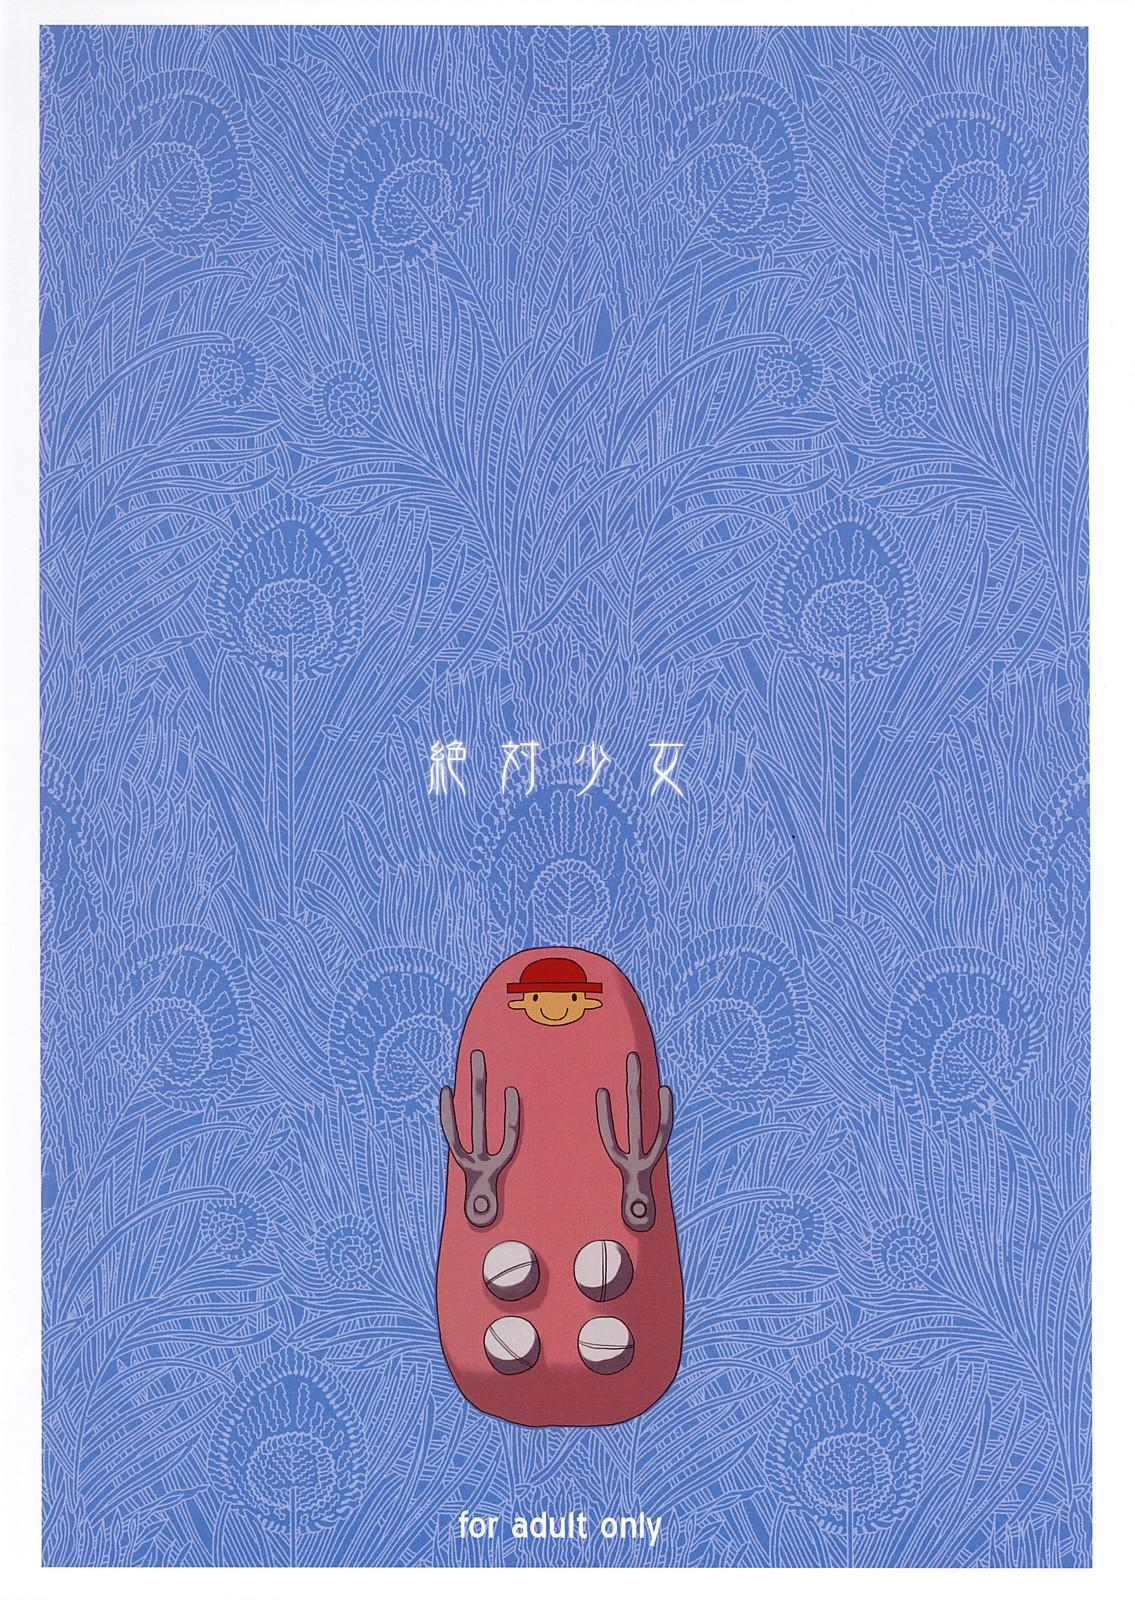 Megane no Kimochi 21